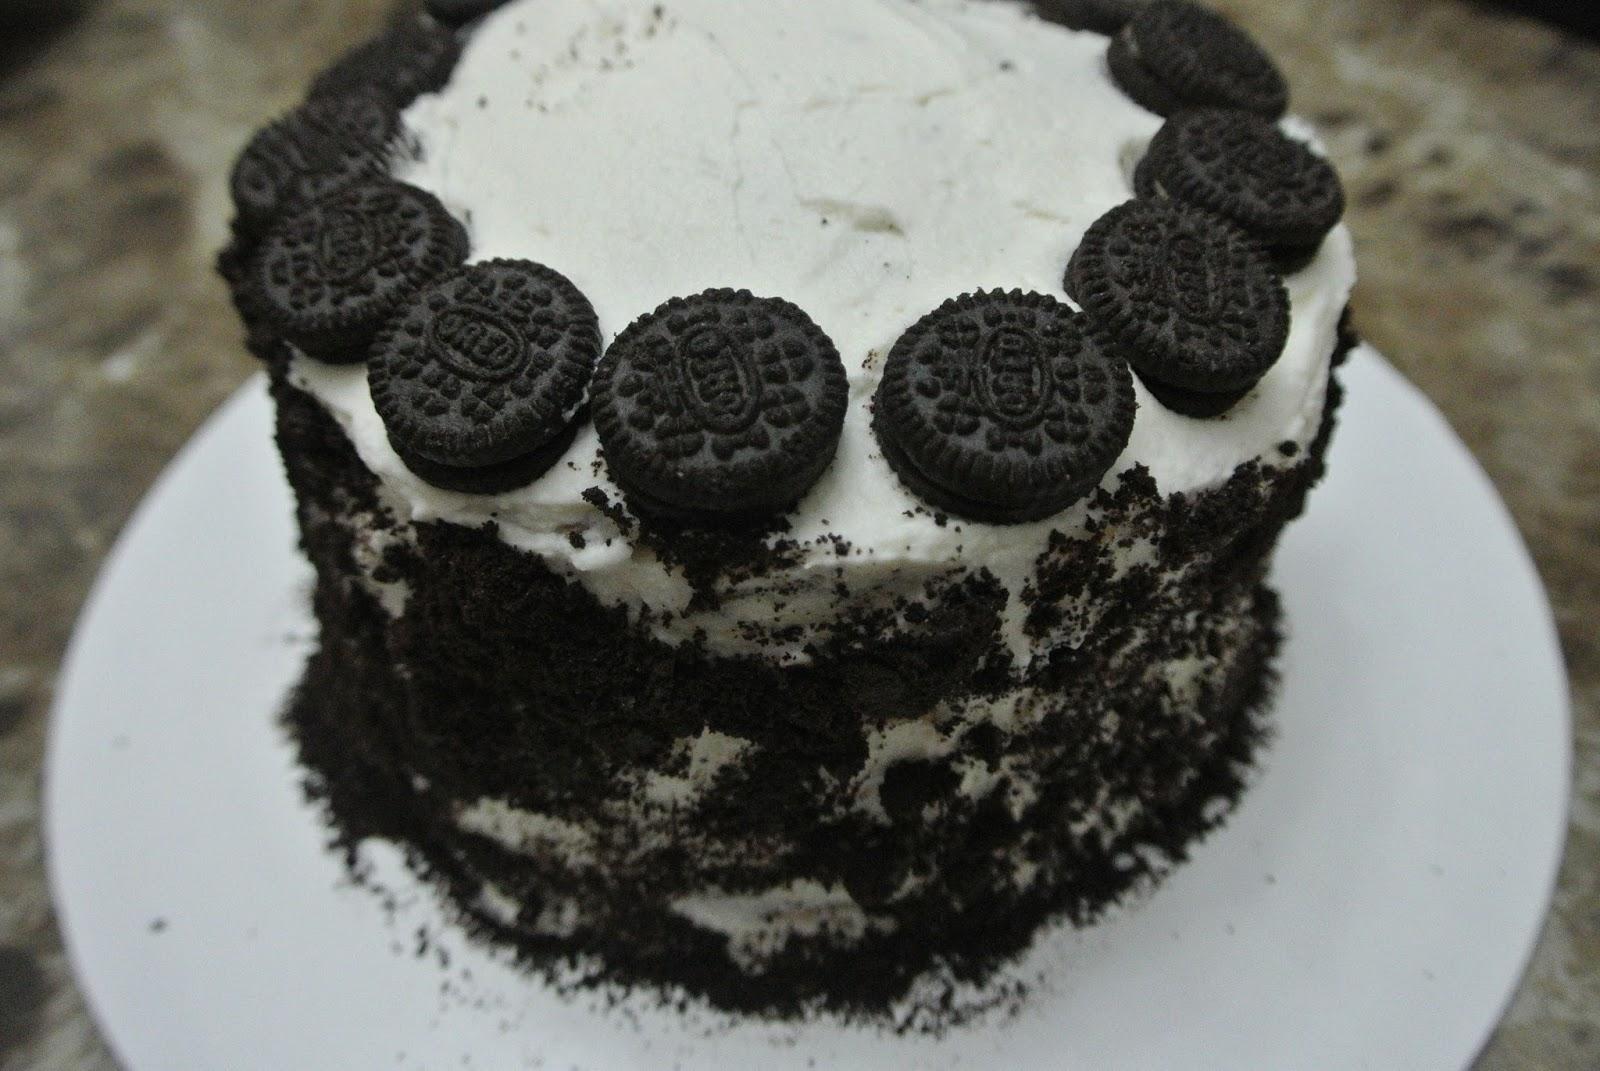 Korean Crepe Cake Recipe: OREO MILLE CRÊPE CAKE